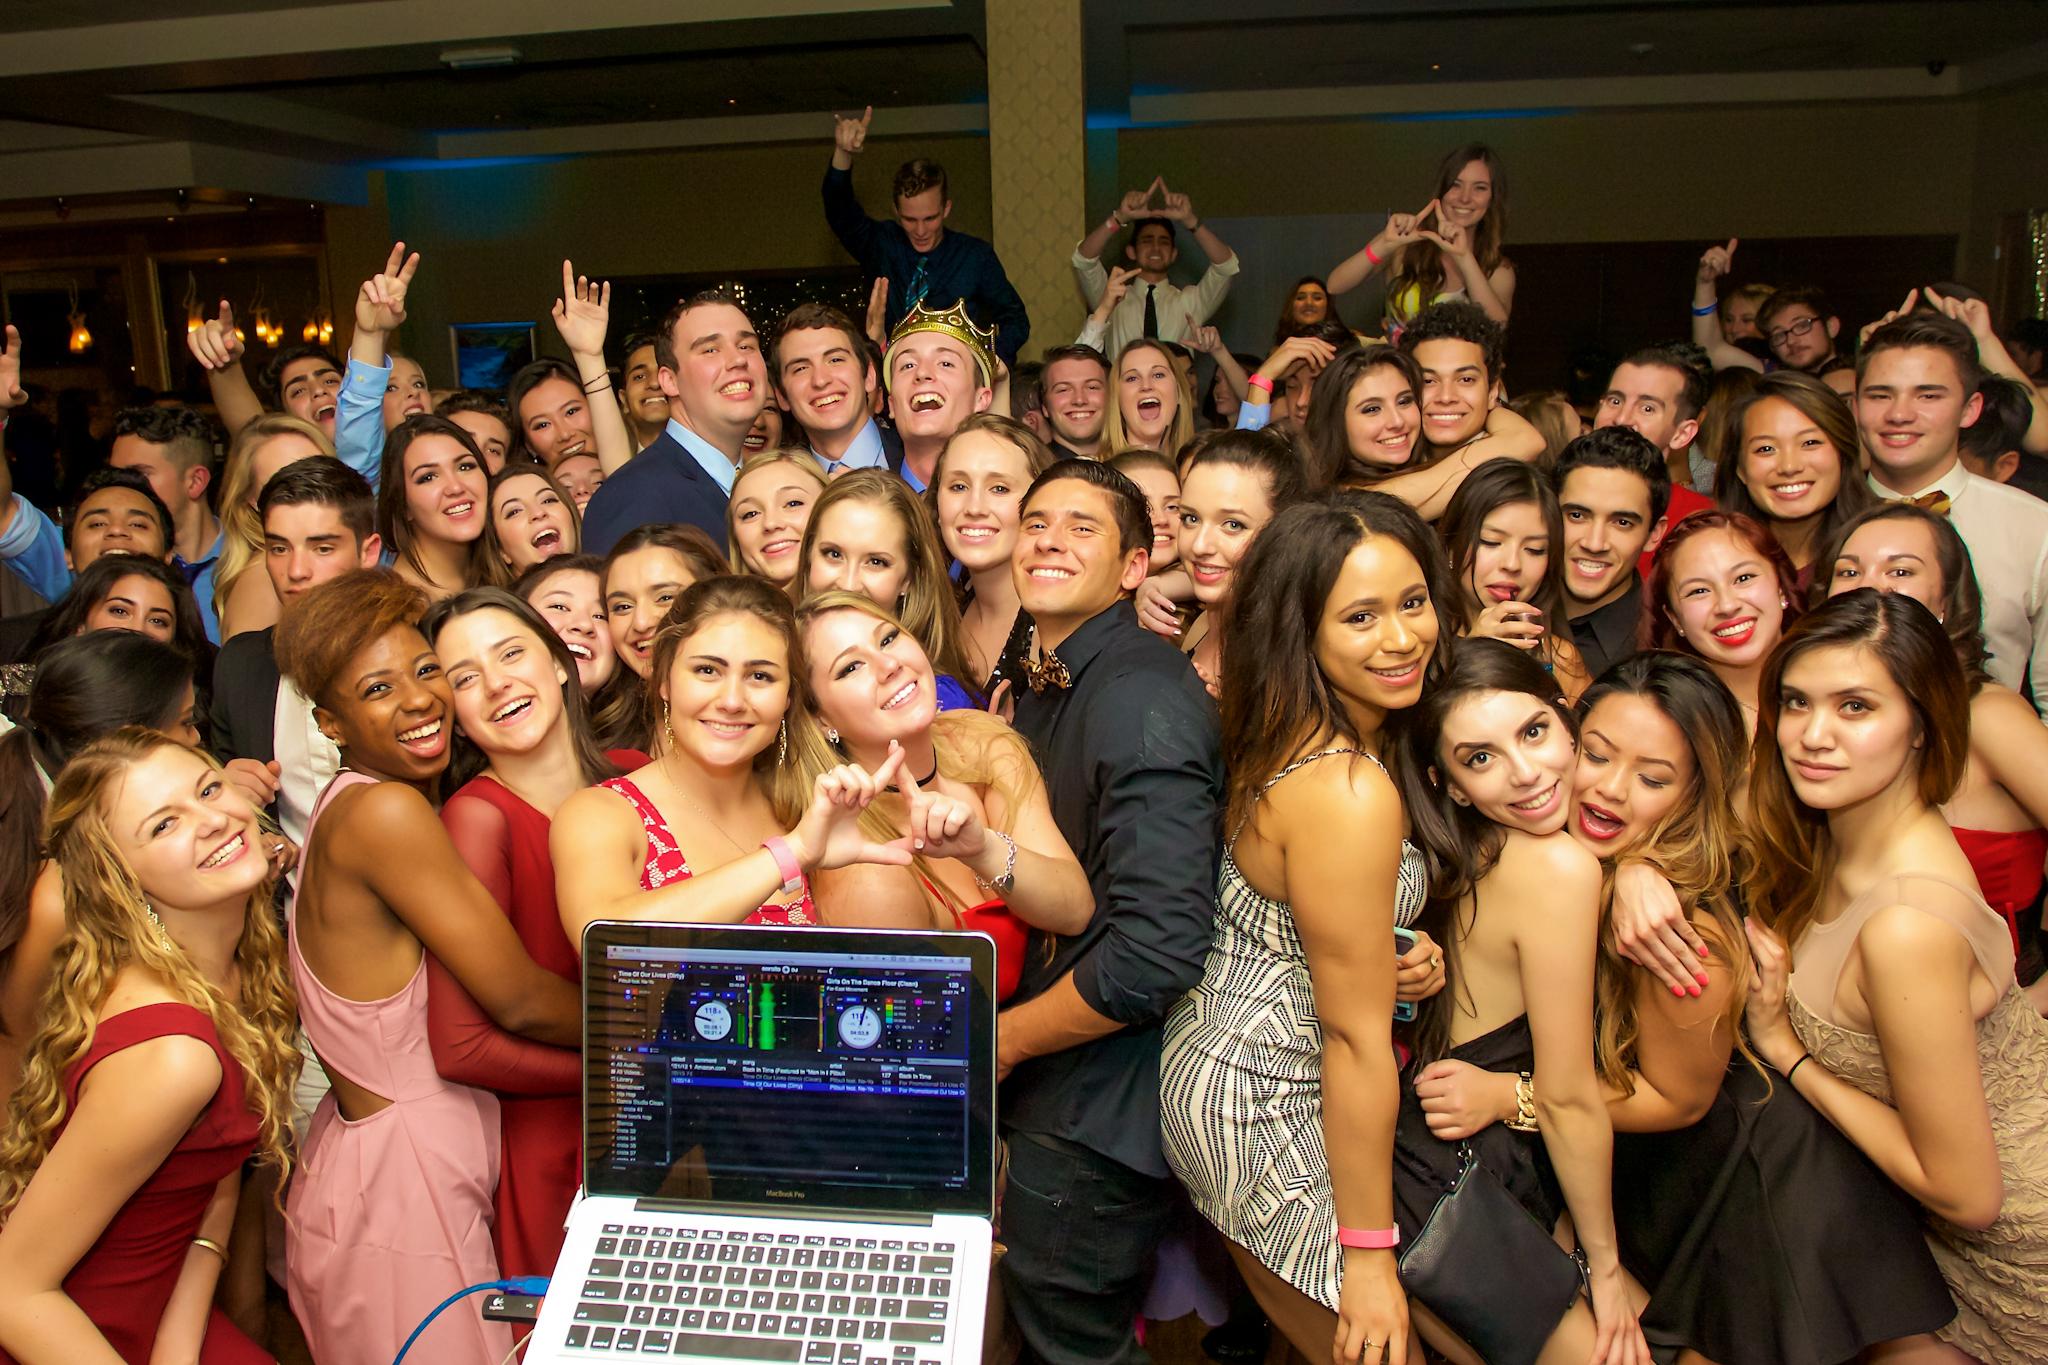 UCI Delta Delta Delta Crush Party 02/27/15